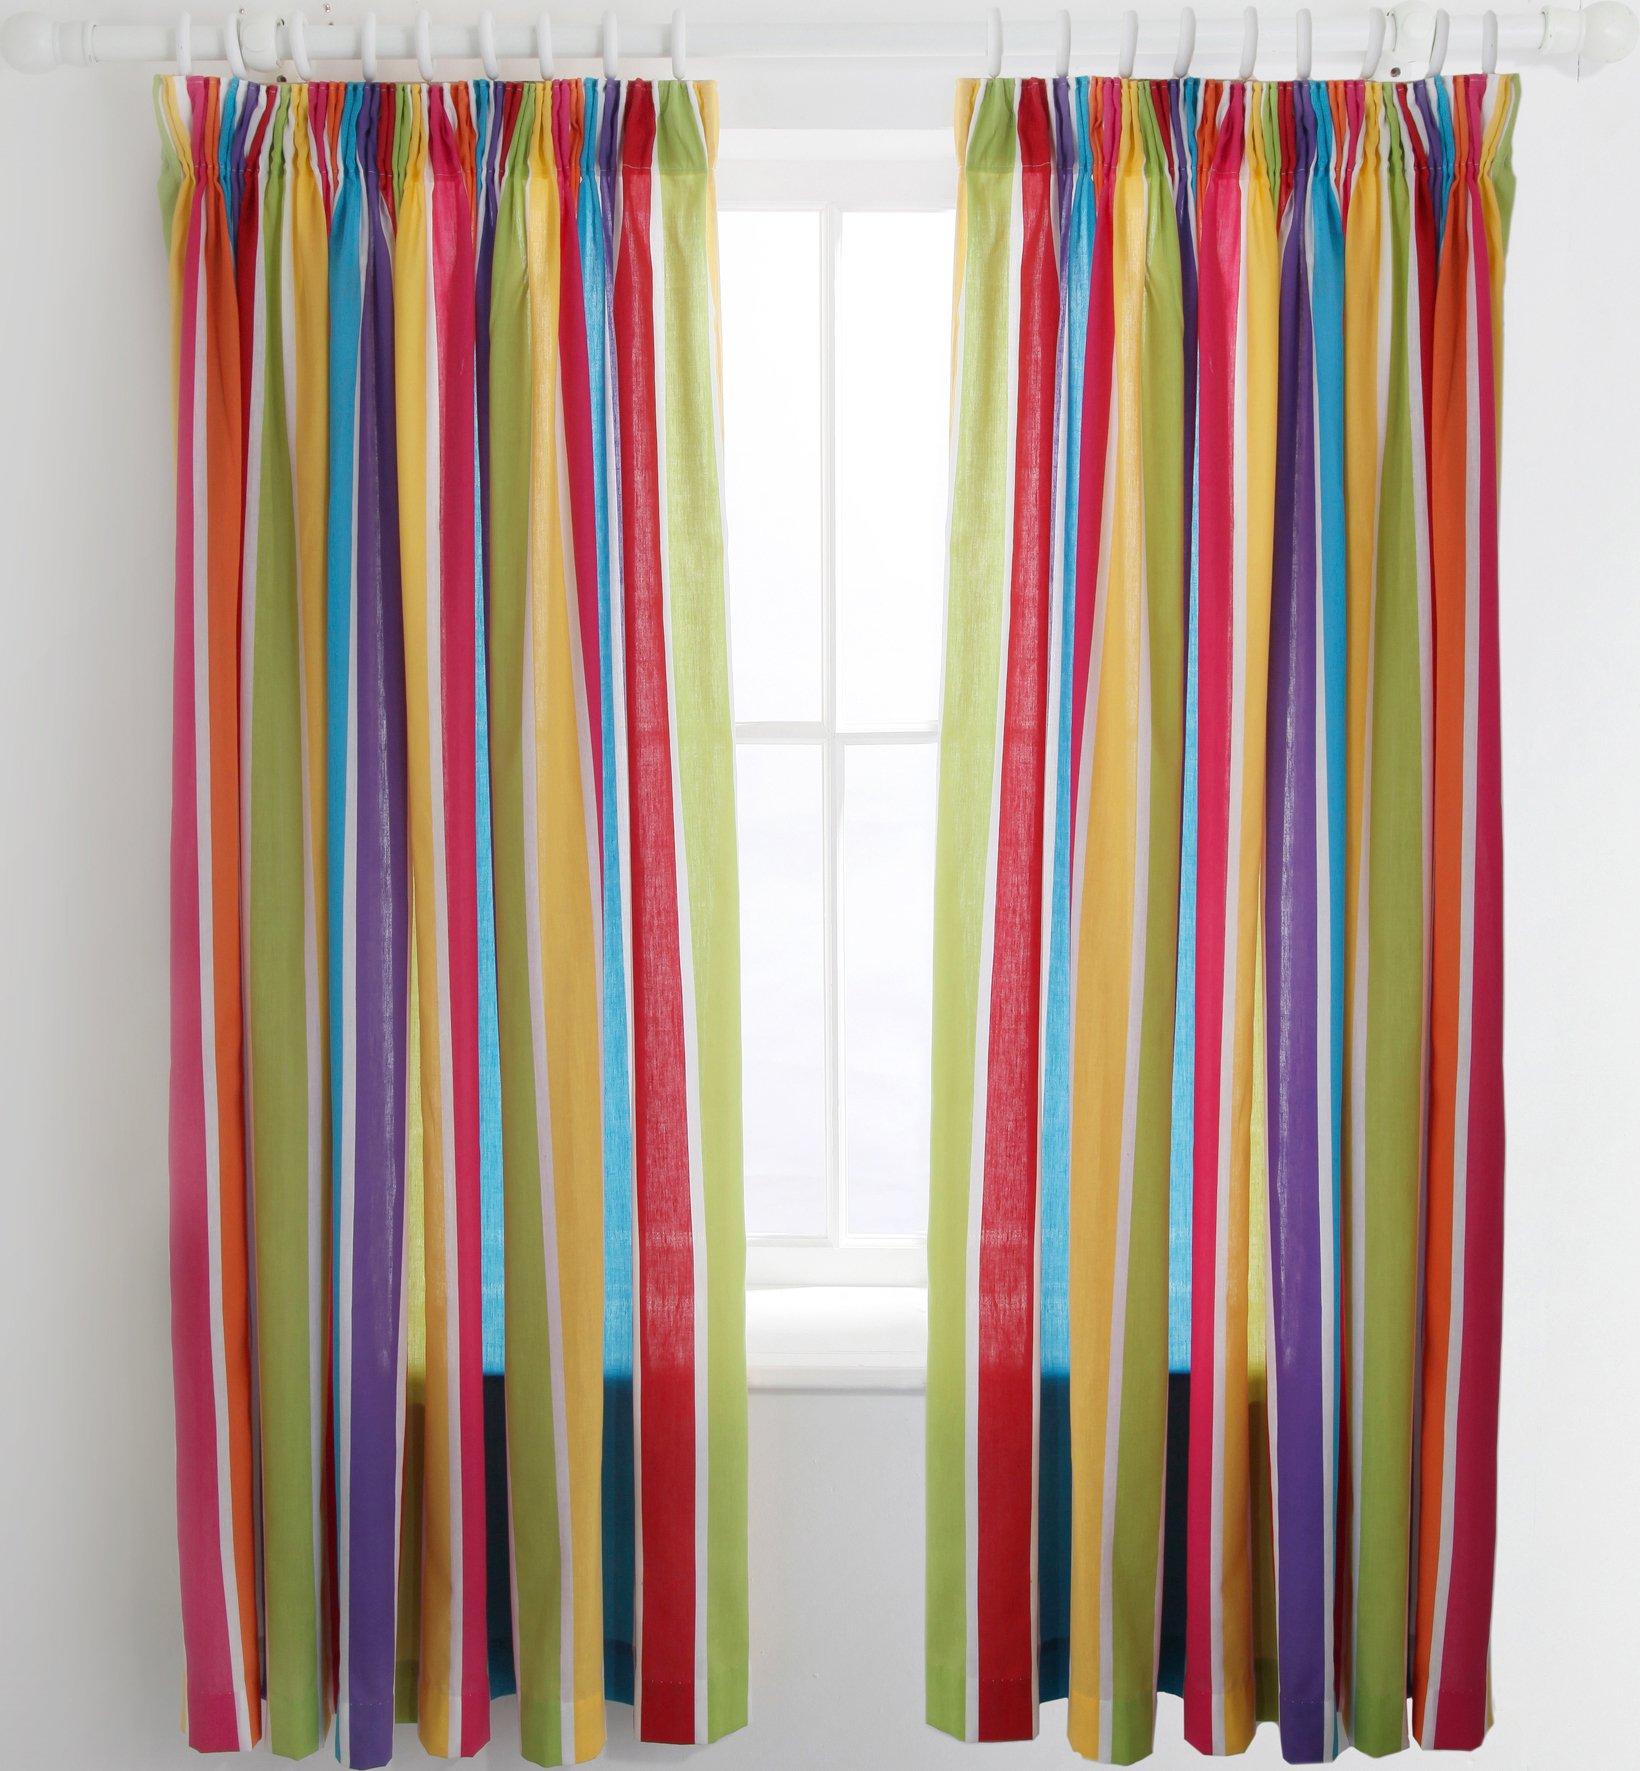 colourmatch kidsu0027 blackout curtains 168 x 137cm stripe